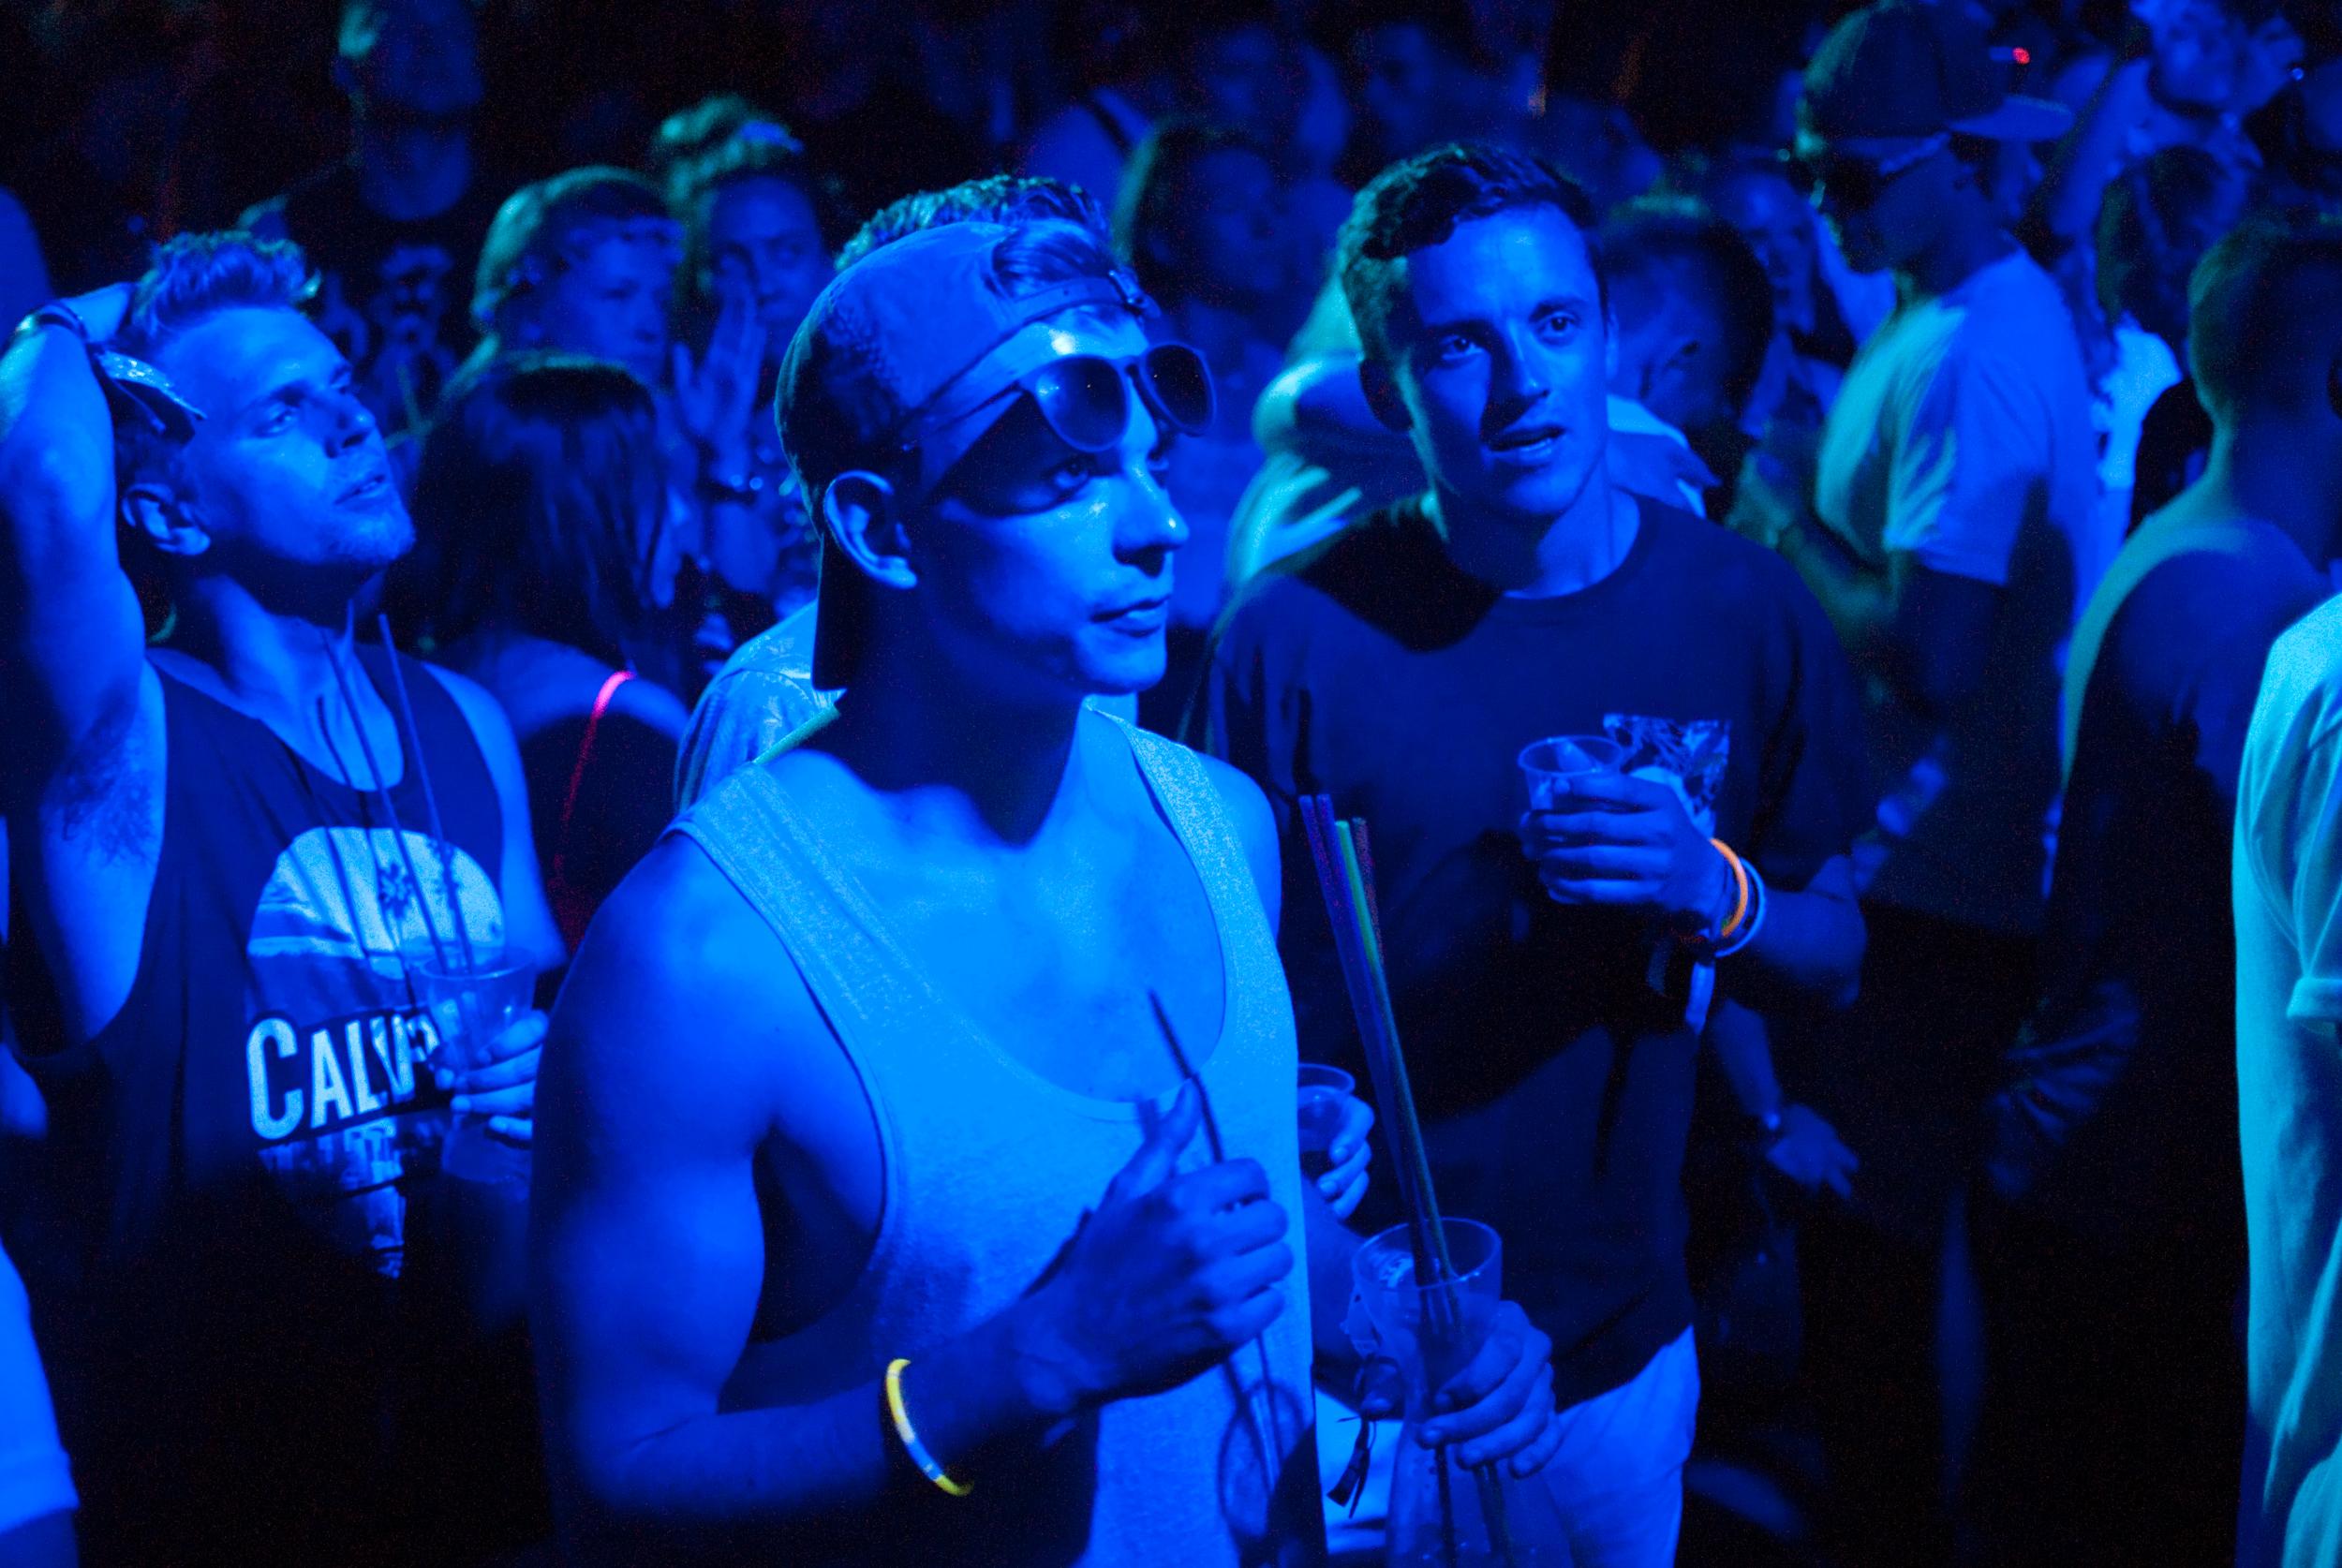 GeorginaCook_hideout_festival_croatia_blue_boys.jpg